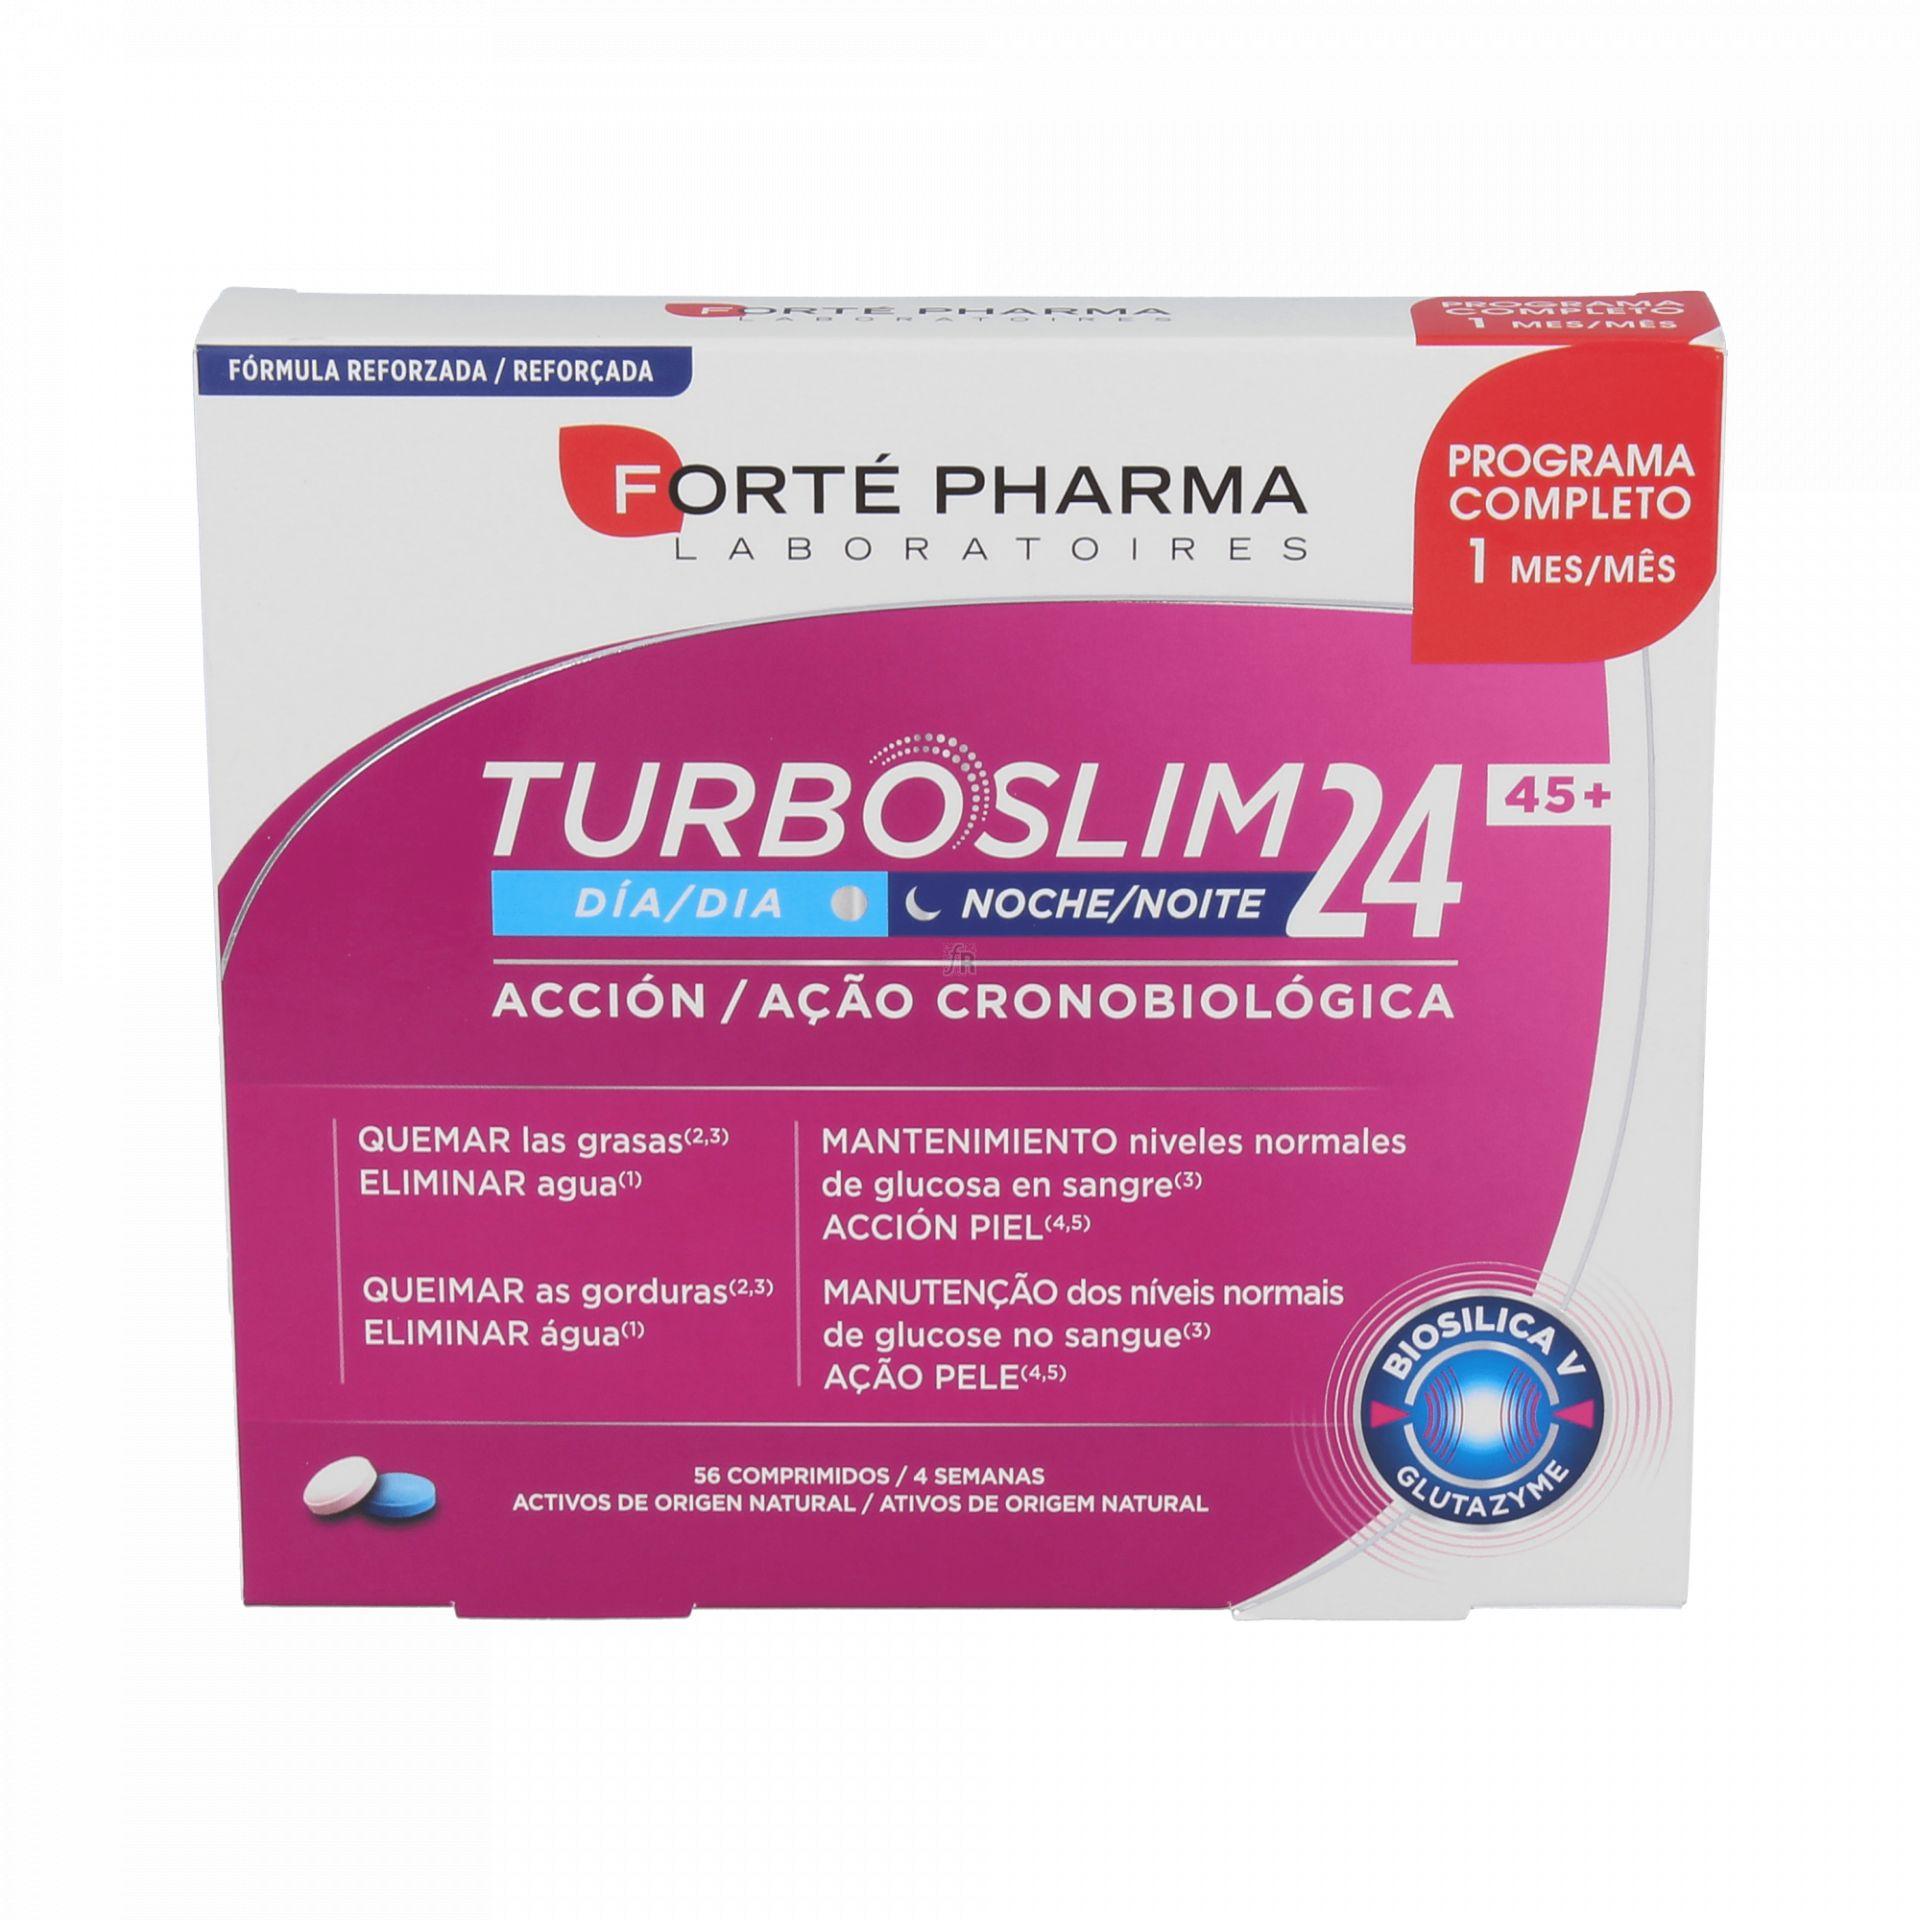 TURBOSLIM CRONOACTIVE 45+ 56 COMPRIMIDOS